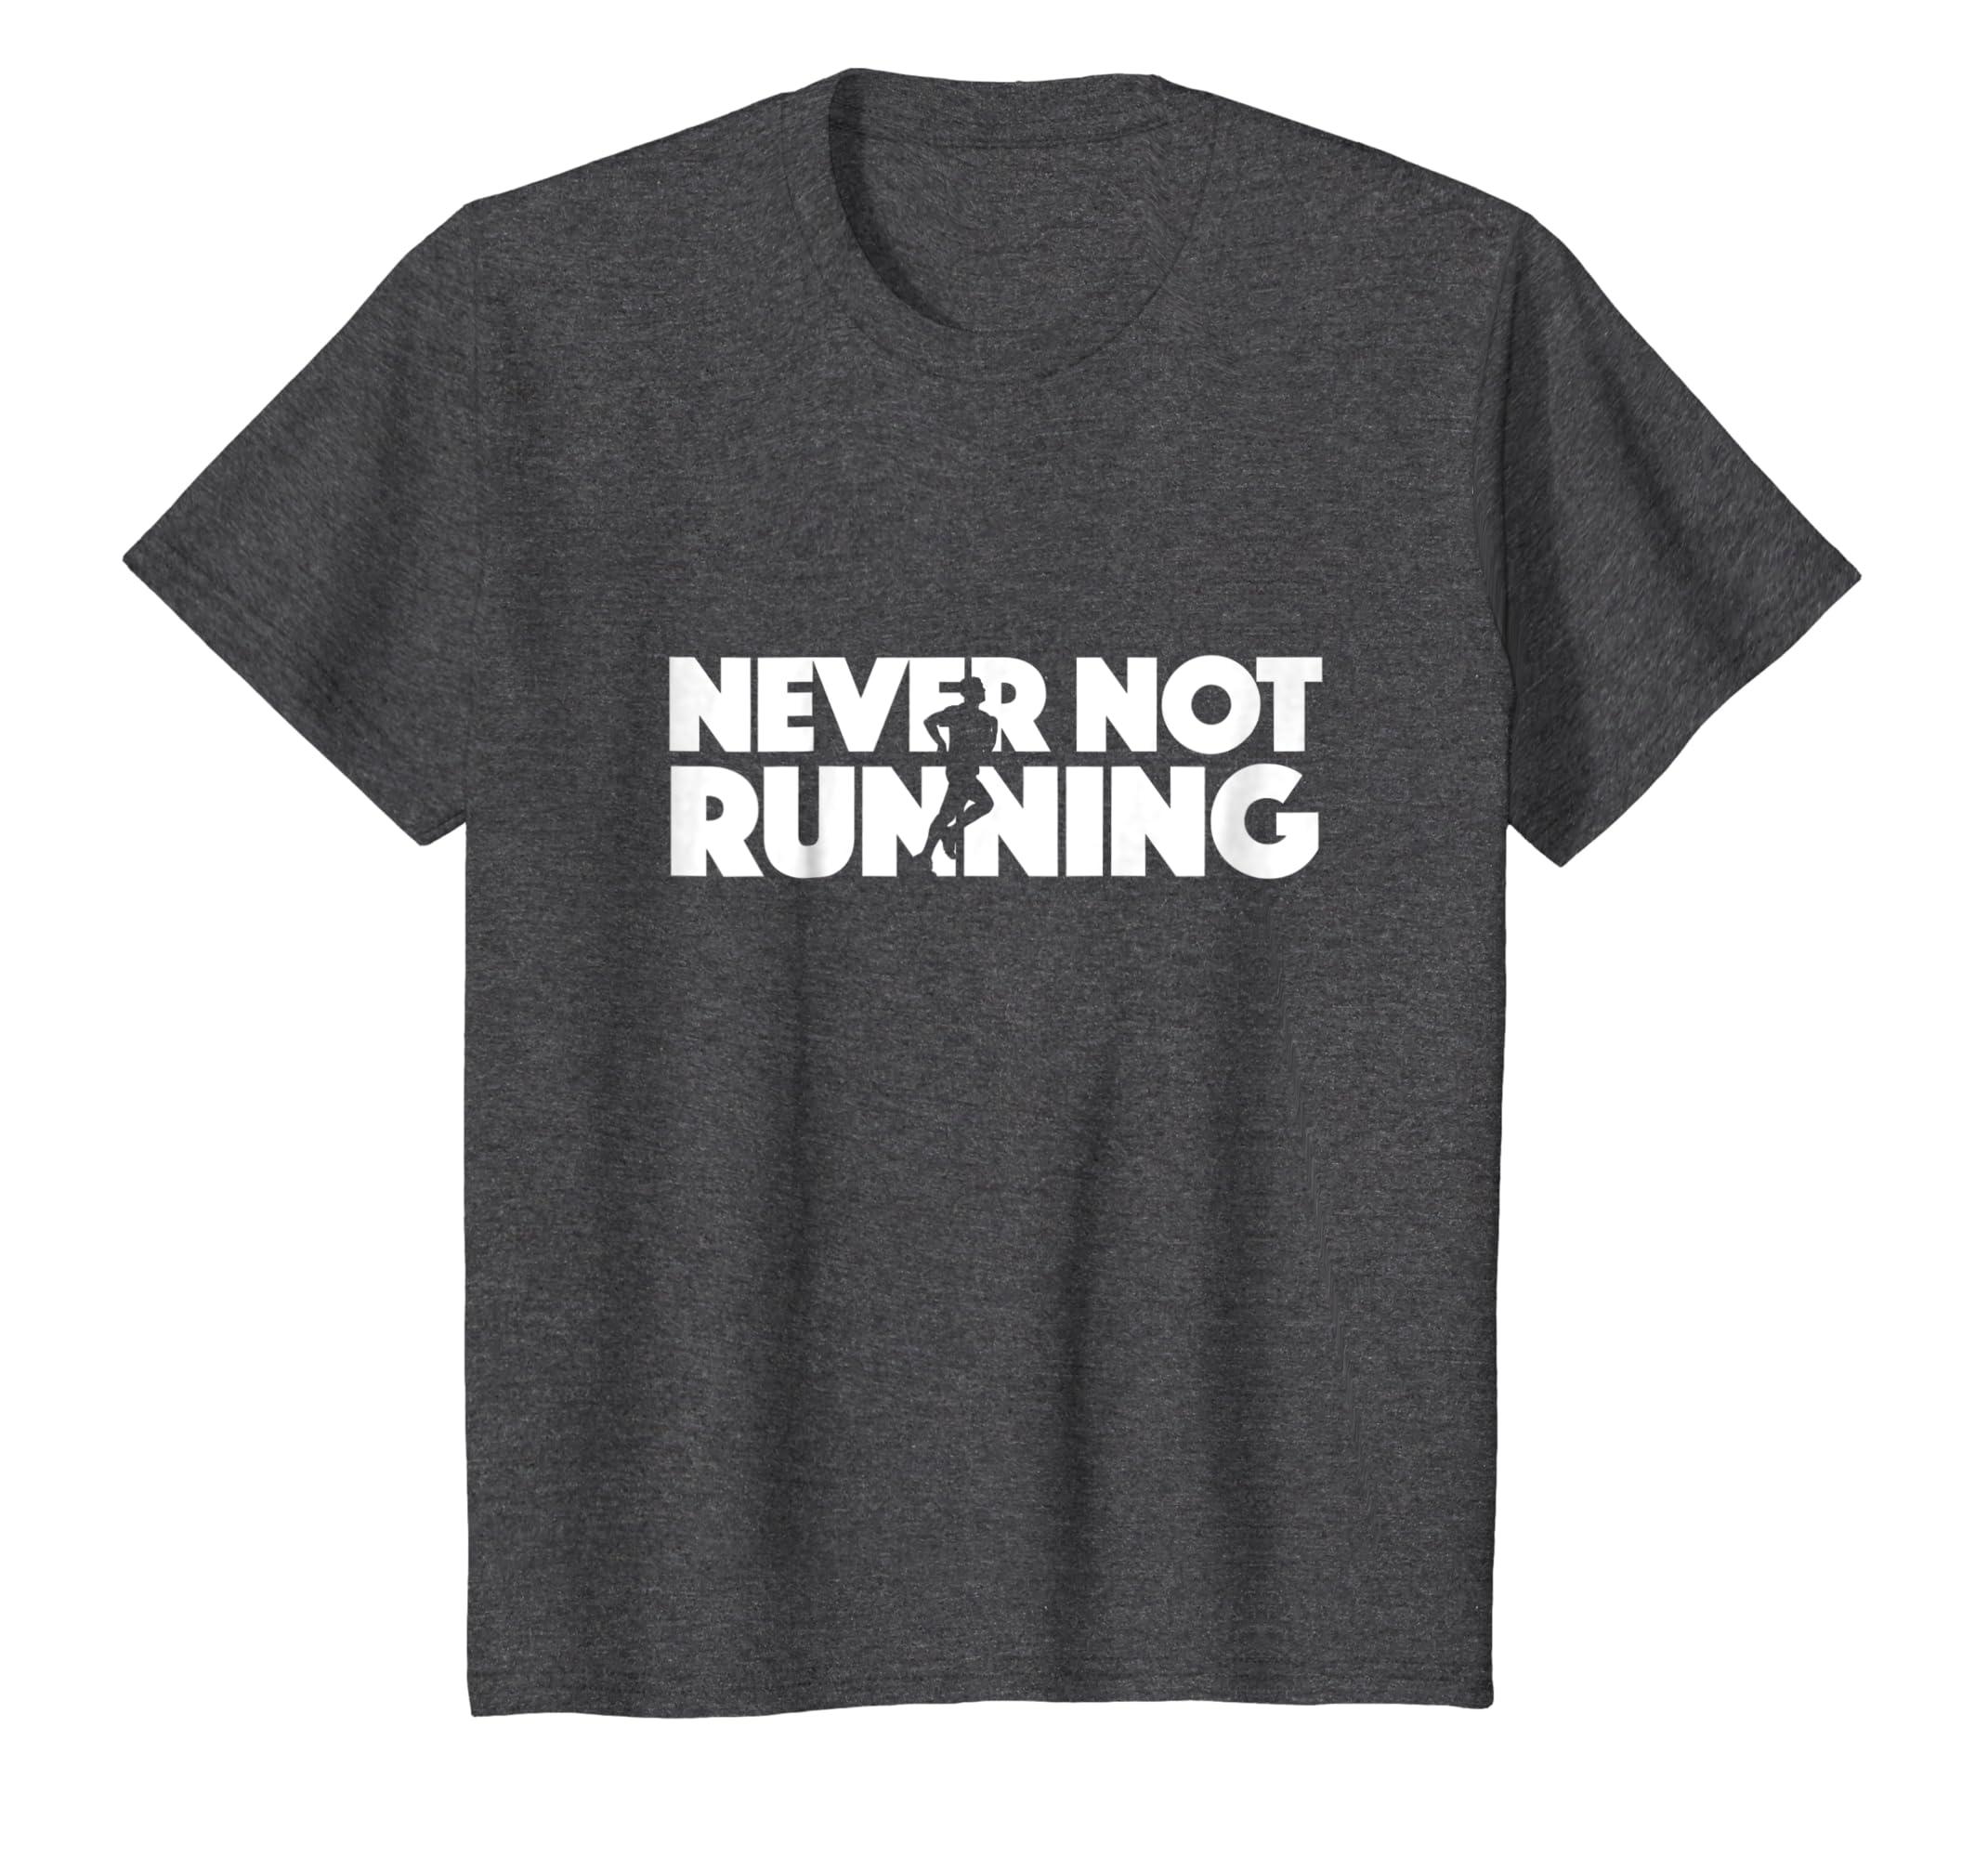 Amazon.com: Running Quotes Half Marathon Race Tee T Shirt ...